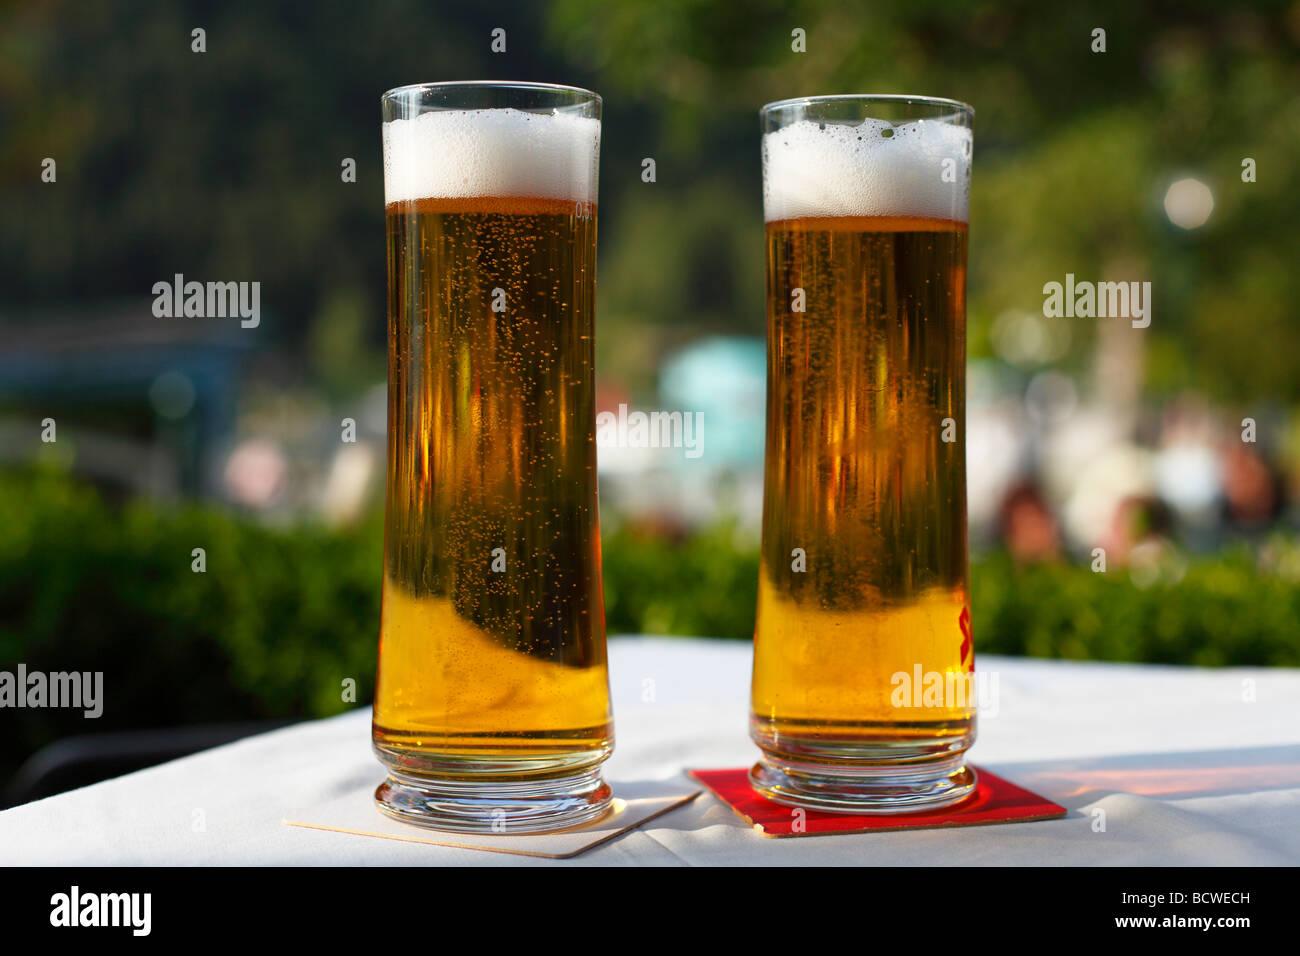 Beer glasses, Strobl, Salzkammergut region, Upper Austria, Austria, Europe Stock Photo